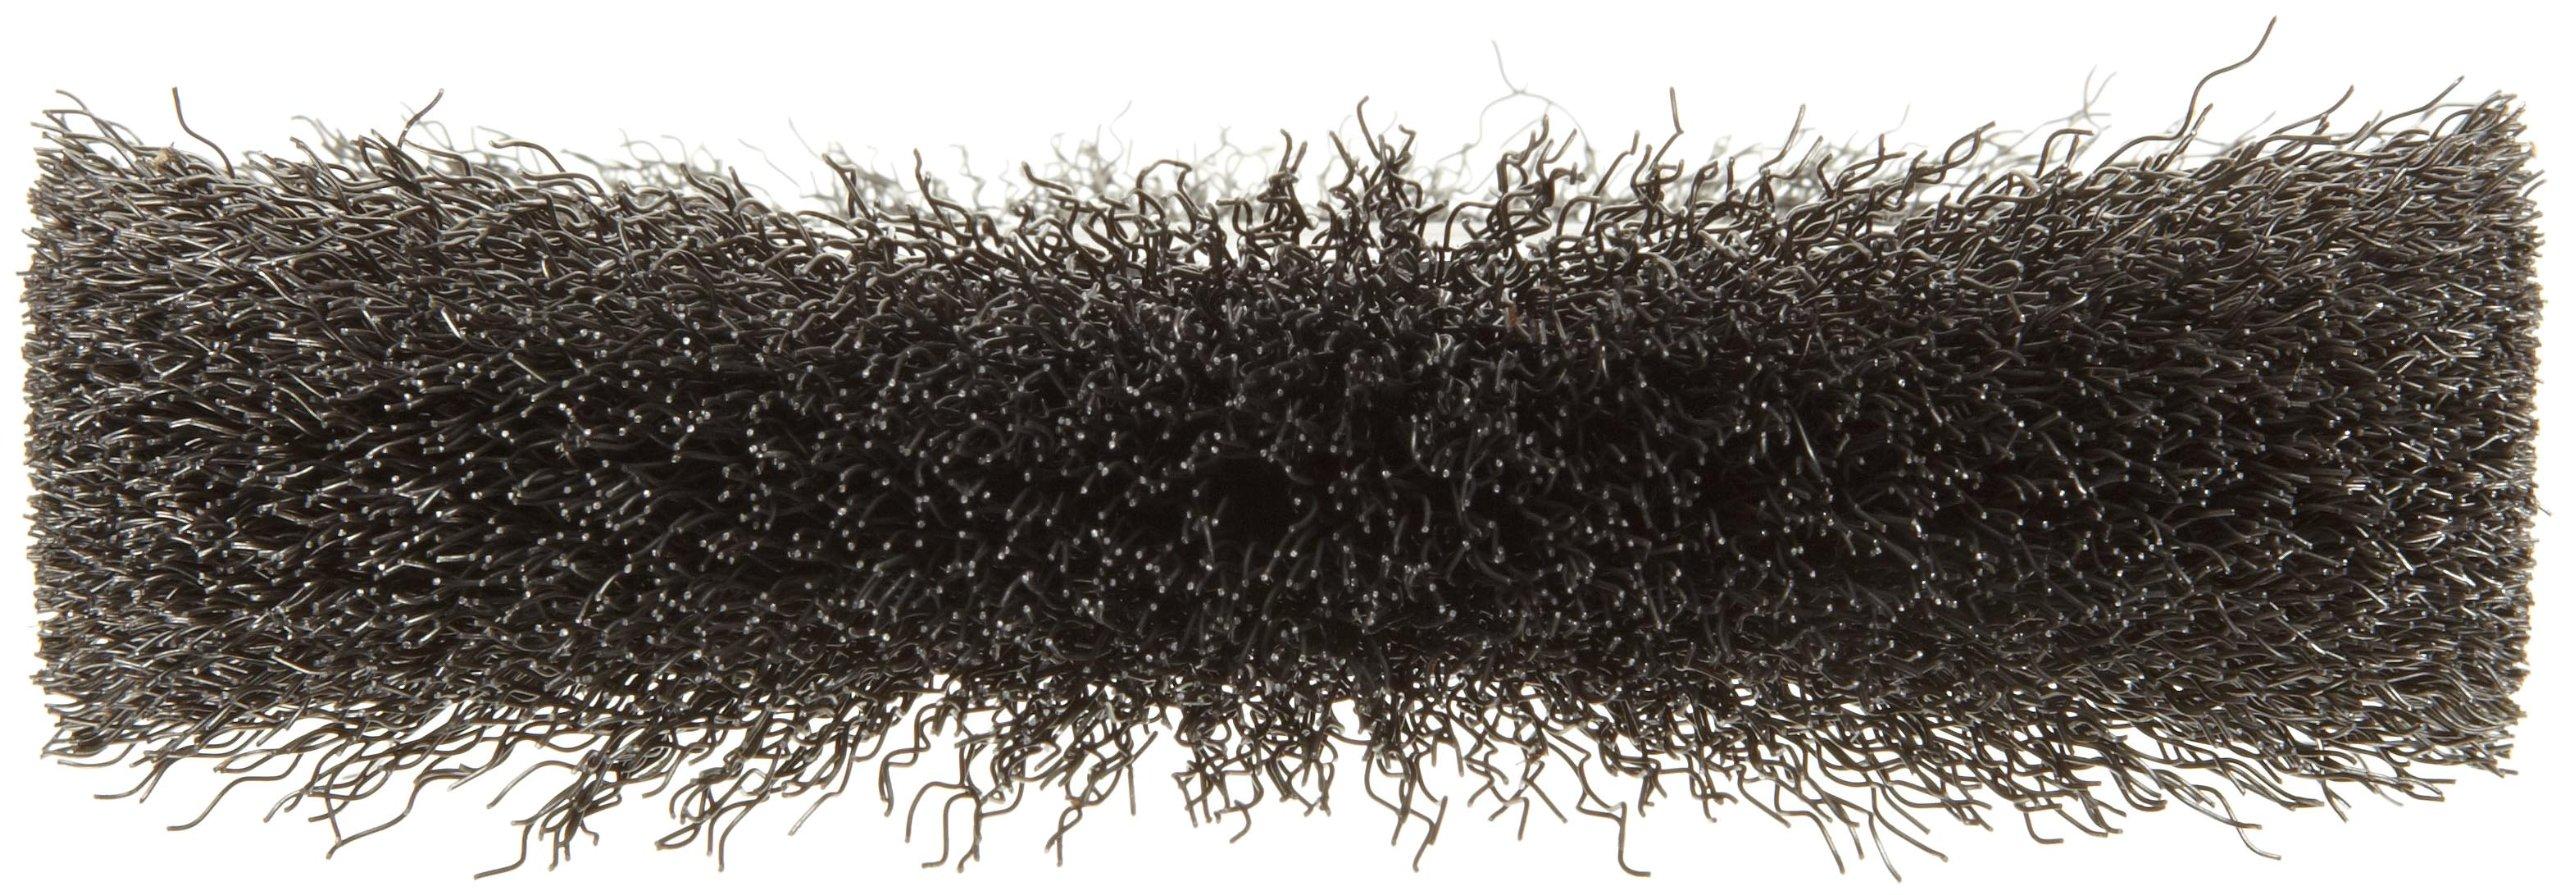 Weiler Trulock Medium Face Wire Wheel Brush, Round Hole, Steel, Crimped Wire, 6'' Diameter, 0.014'' Wire Diameter, 2'' Arbor, 1-1/8'' Bristle Length, 1'' Brush Face Width, 6000 rpm by Weiler (Image #2)